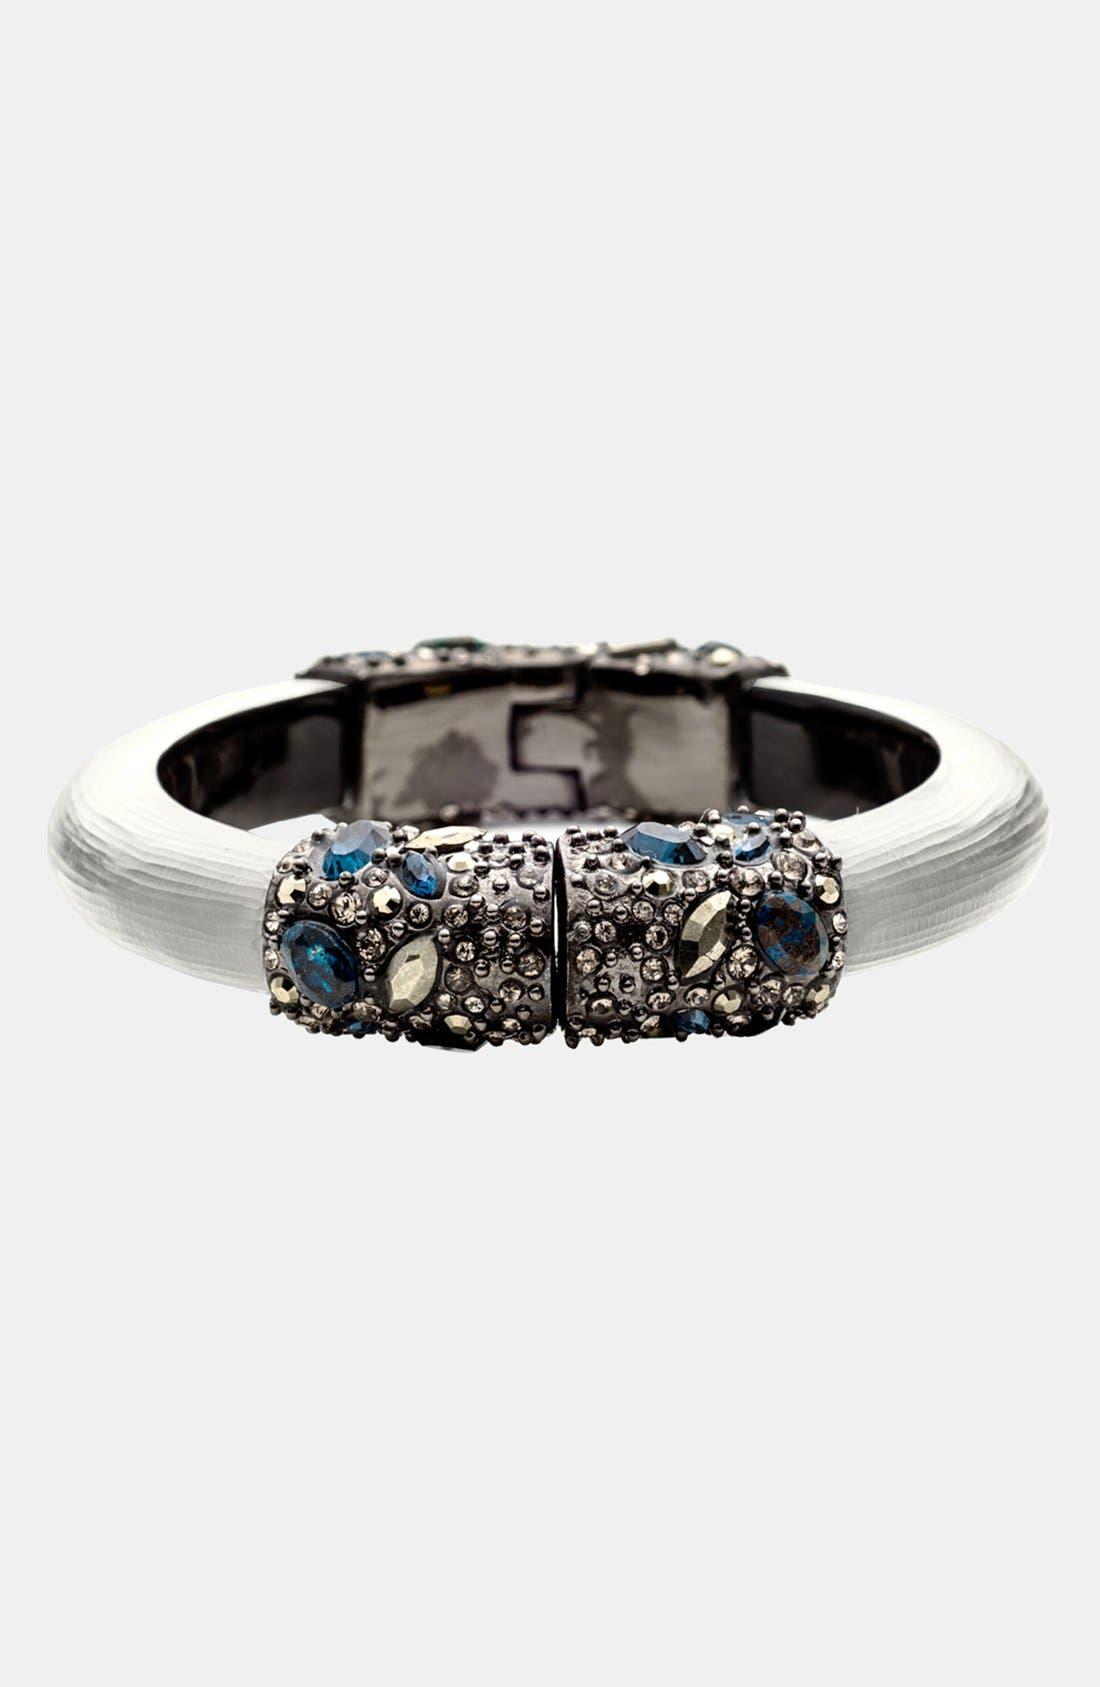 Main Image - Alexis Bittar 'Lucite® - Neo Bohemian' Hinged Bracelet